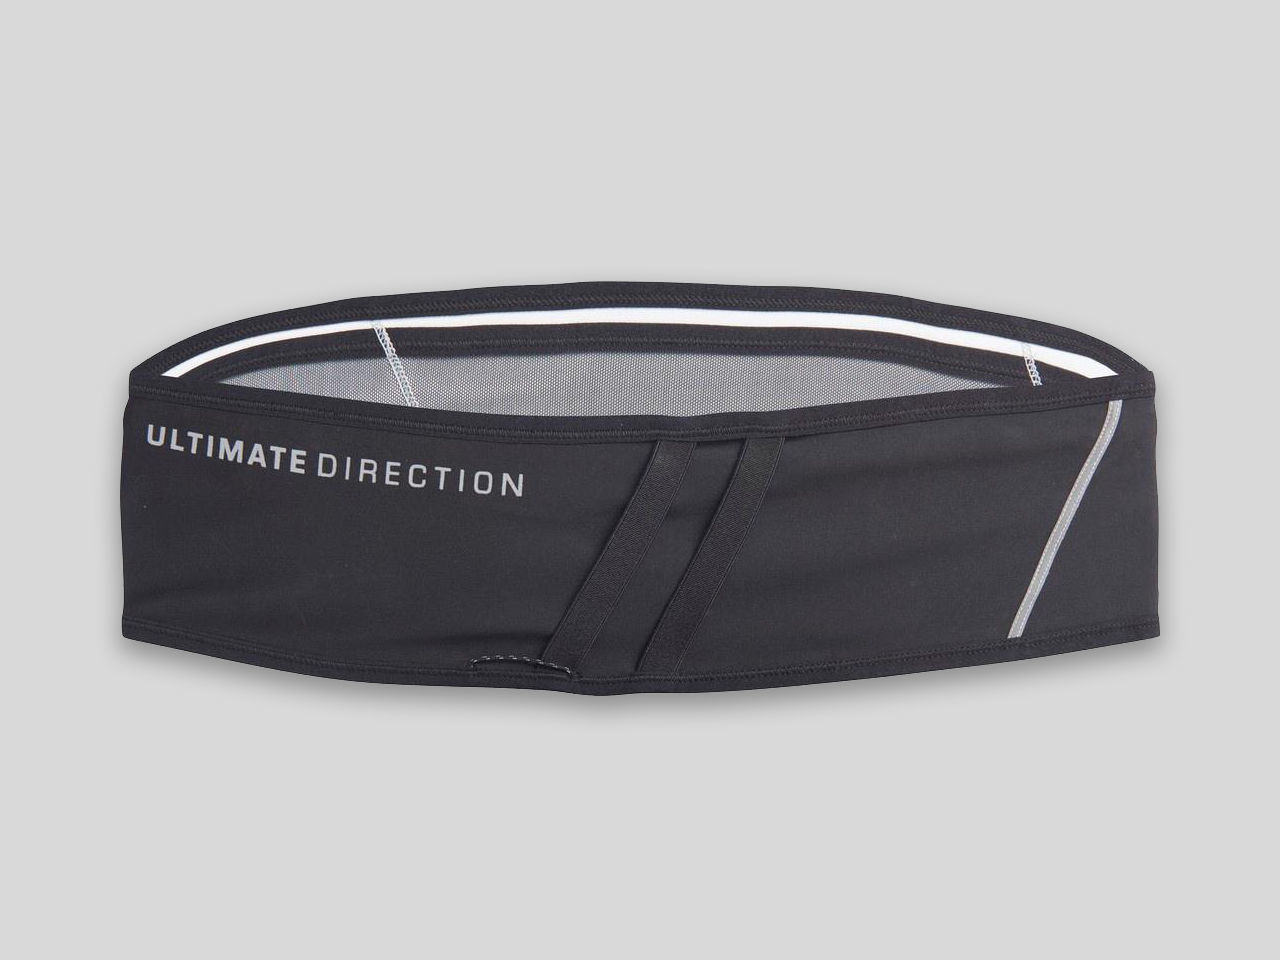 Ultimate Direction Comfort Belt - Svart löparbälte